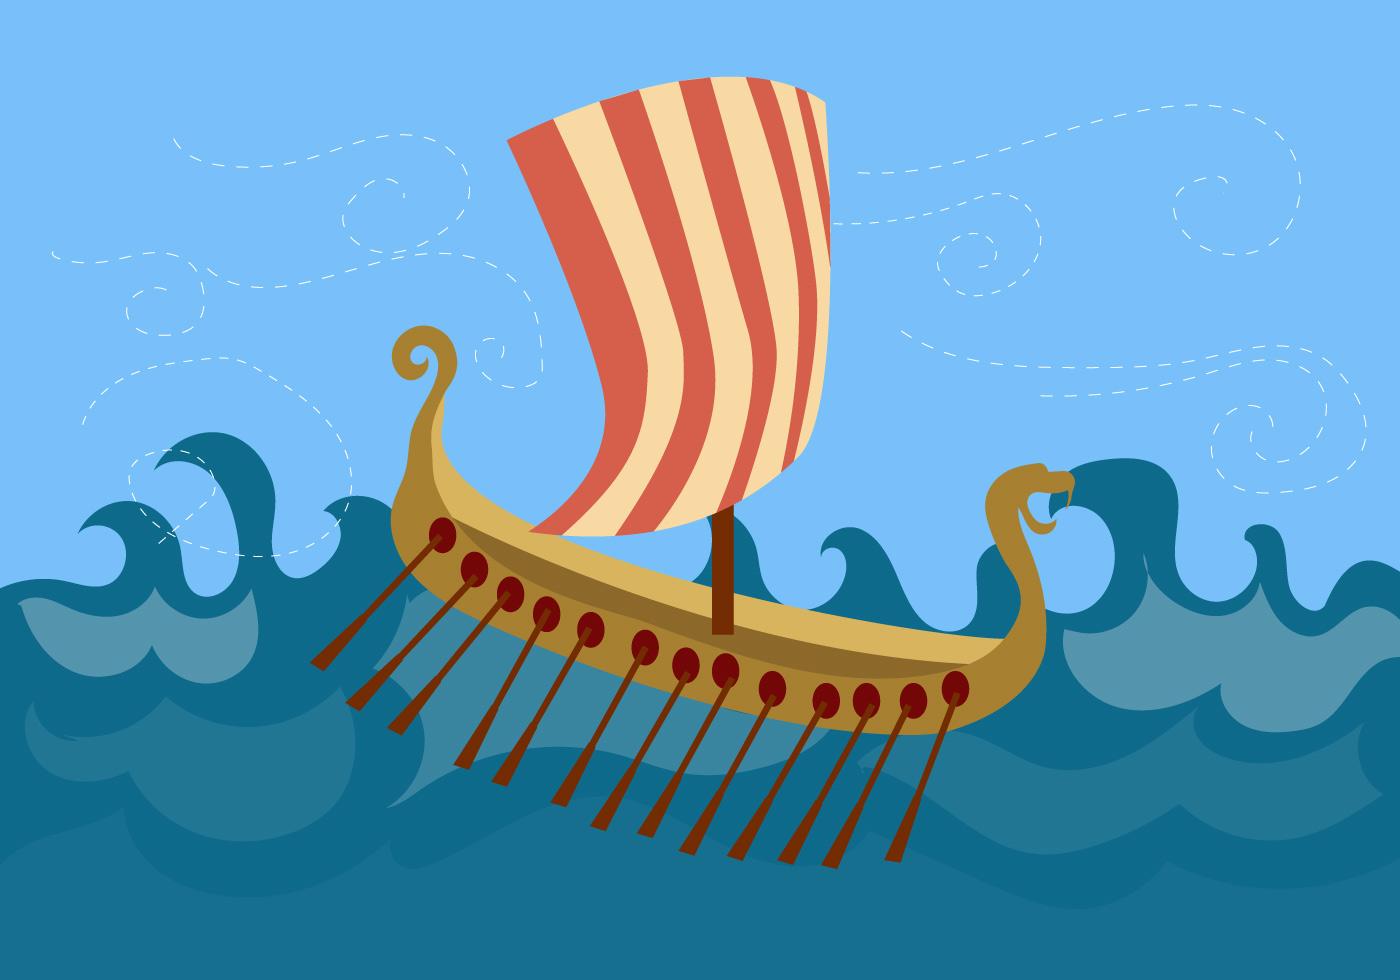 Viking Ship Free Vector - Download Free Vectors, Clipart ...